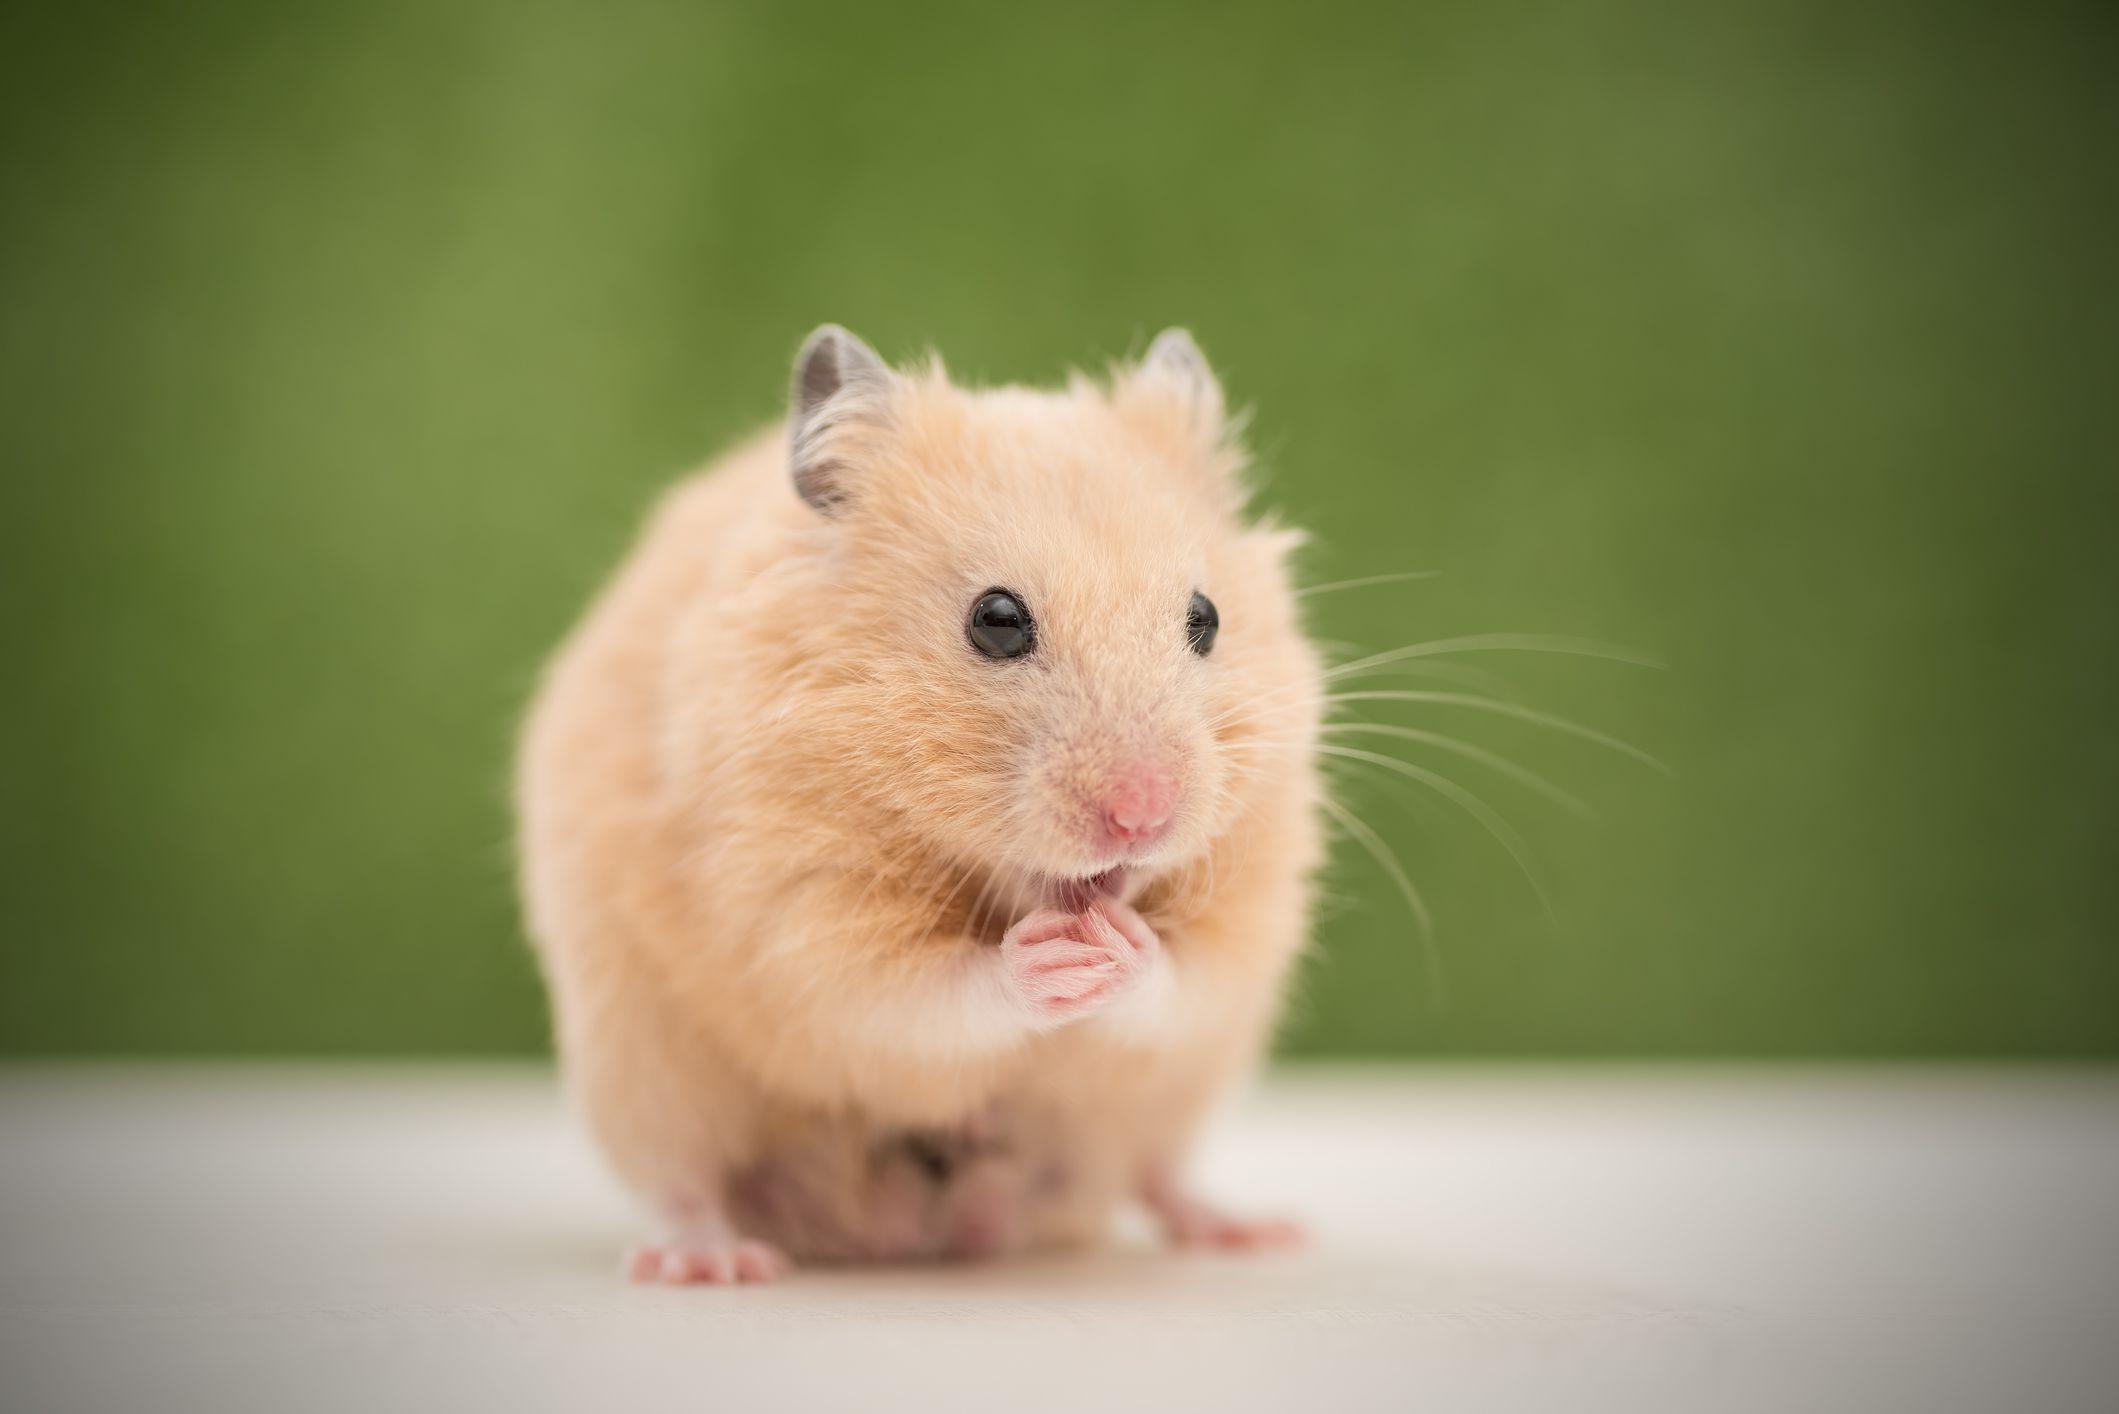 Syrian (Golden) Hamster (Mesocricetus auratus)